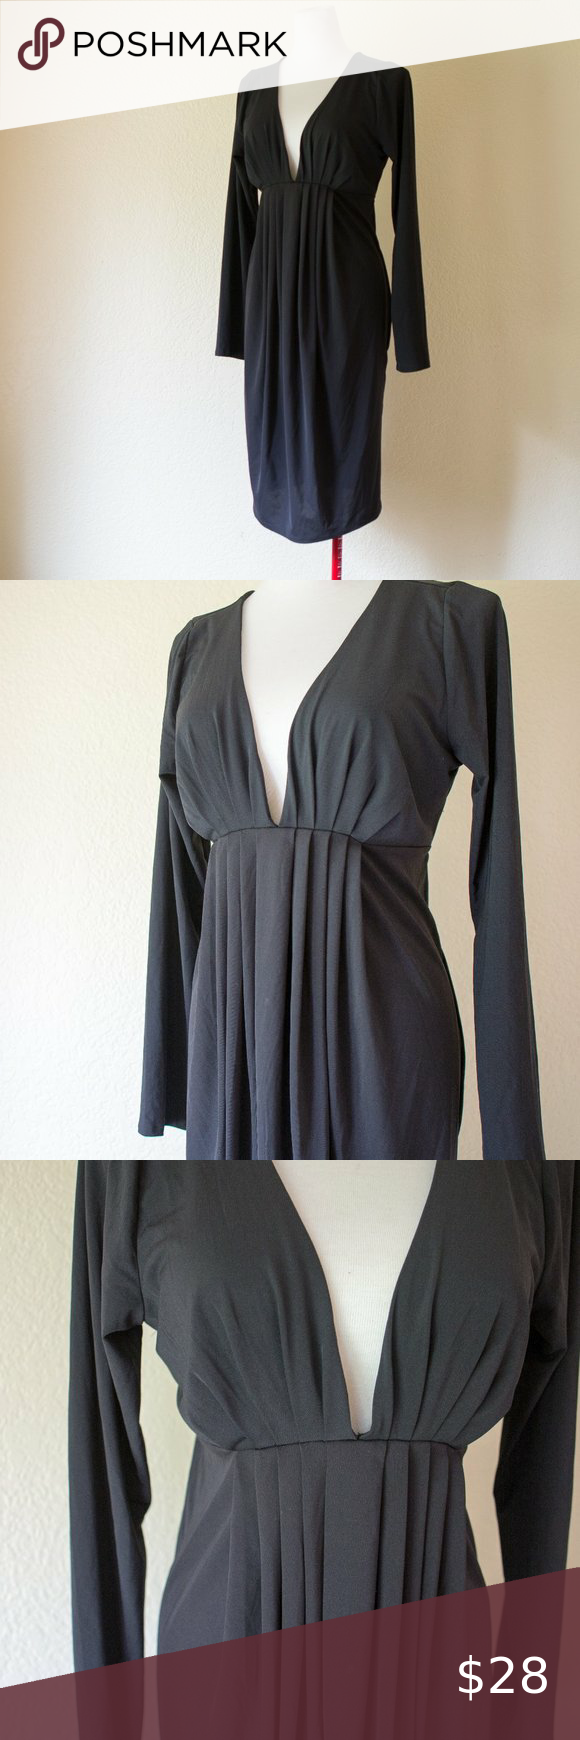 Moda International Elegant Deep V Black Dress Xl Long Sleeve Midi Dress Xl Dress Long Sleeve Dress [ 1740 x 580 Pixel ]